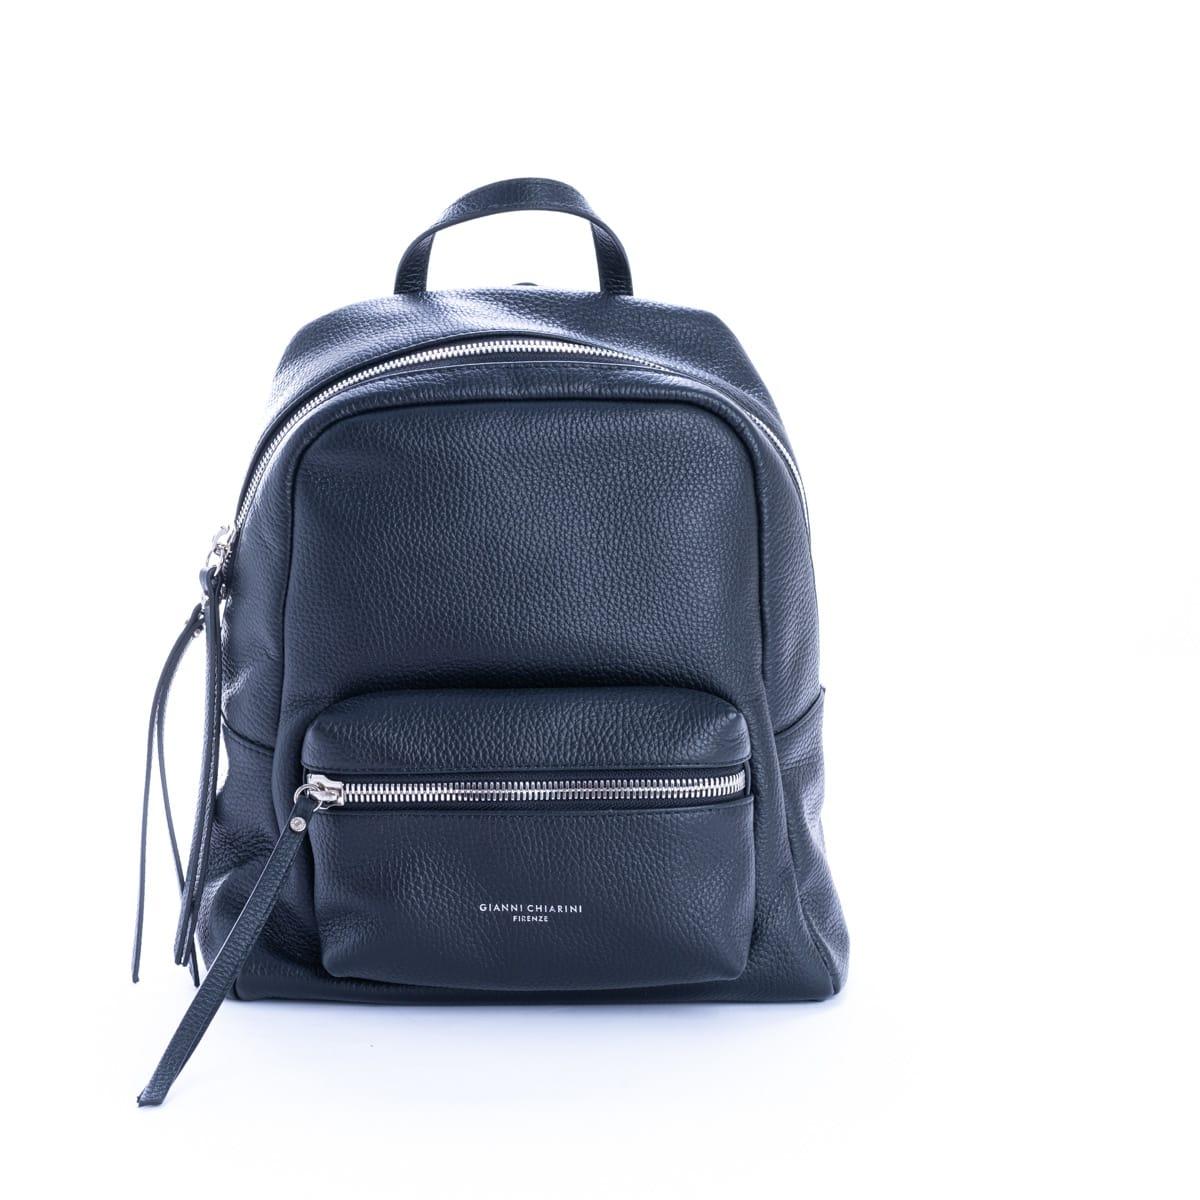 Gianni Chiarini Gianni Chiarini `` Luna Backpack